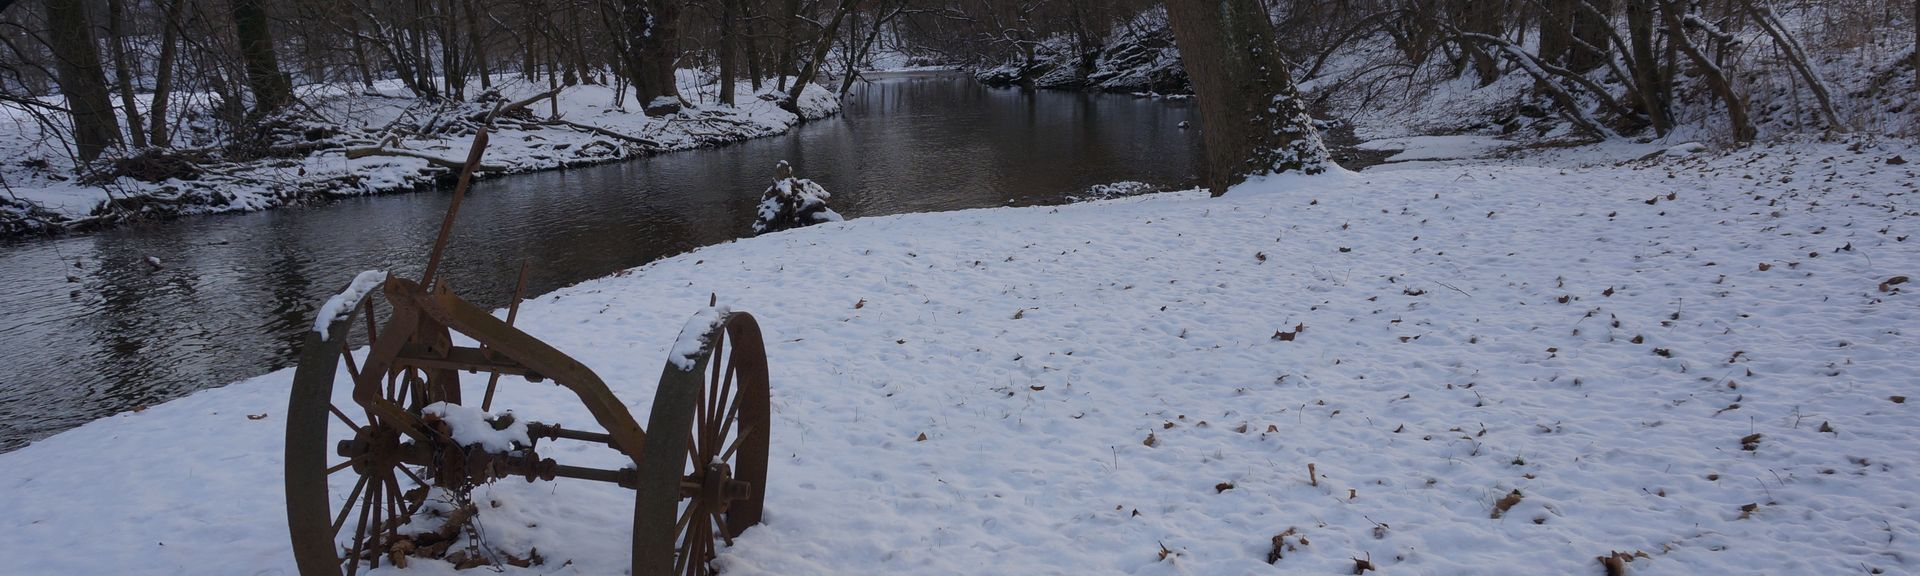 Koziar's Christmas Village, Bernville, Pennsylvania, Vereinigte Staaten